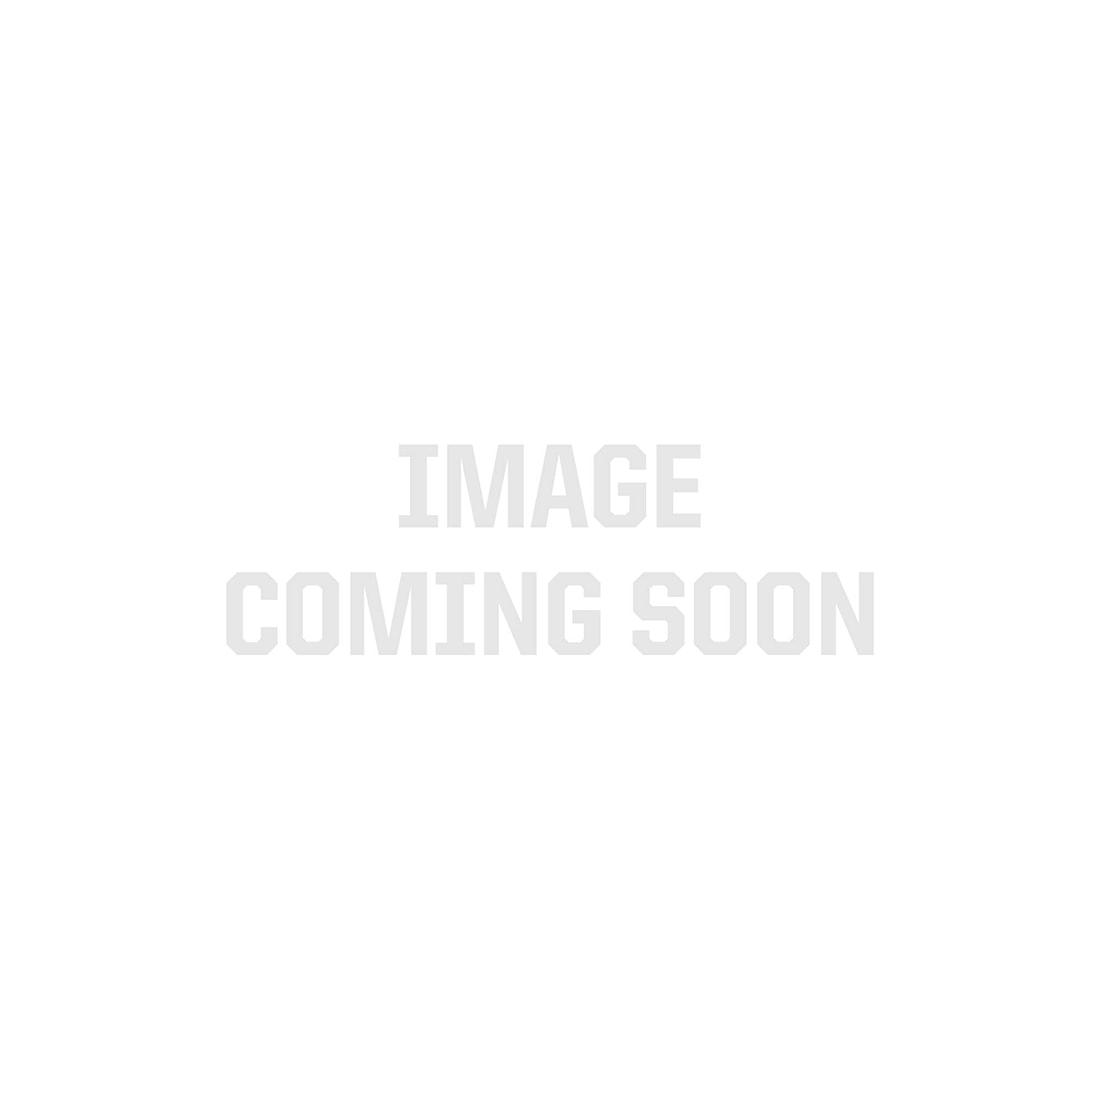 Kichler Design Pro 9 LED 18.9 inch Hardscape Light Bronze